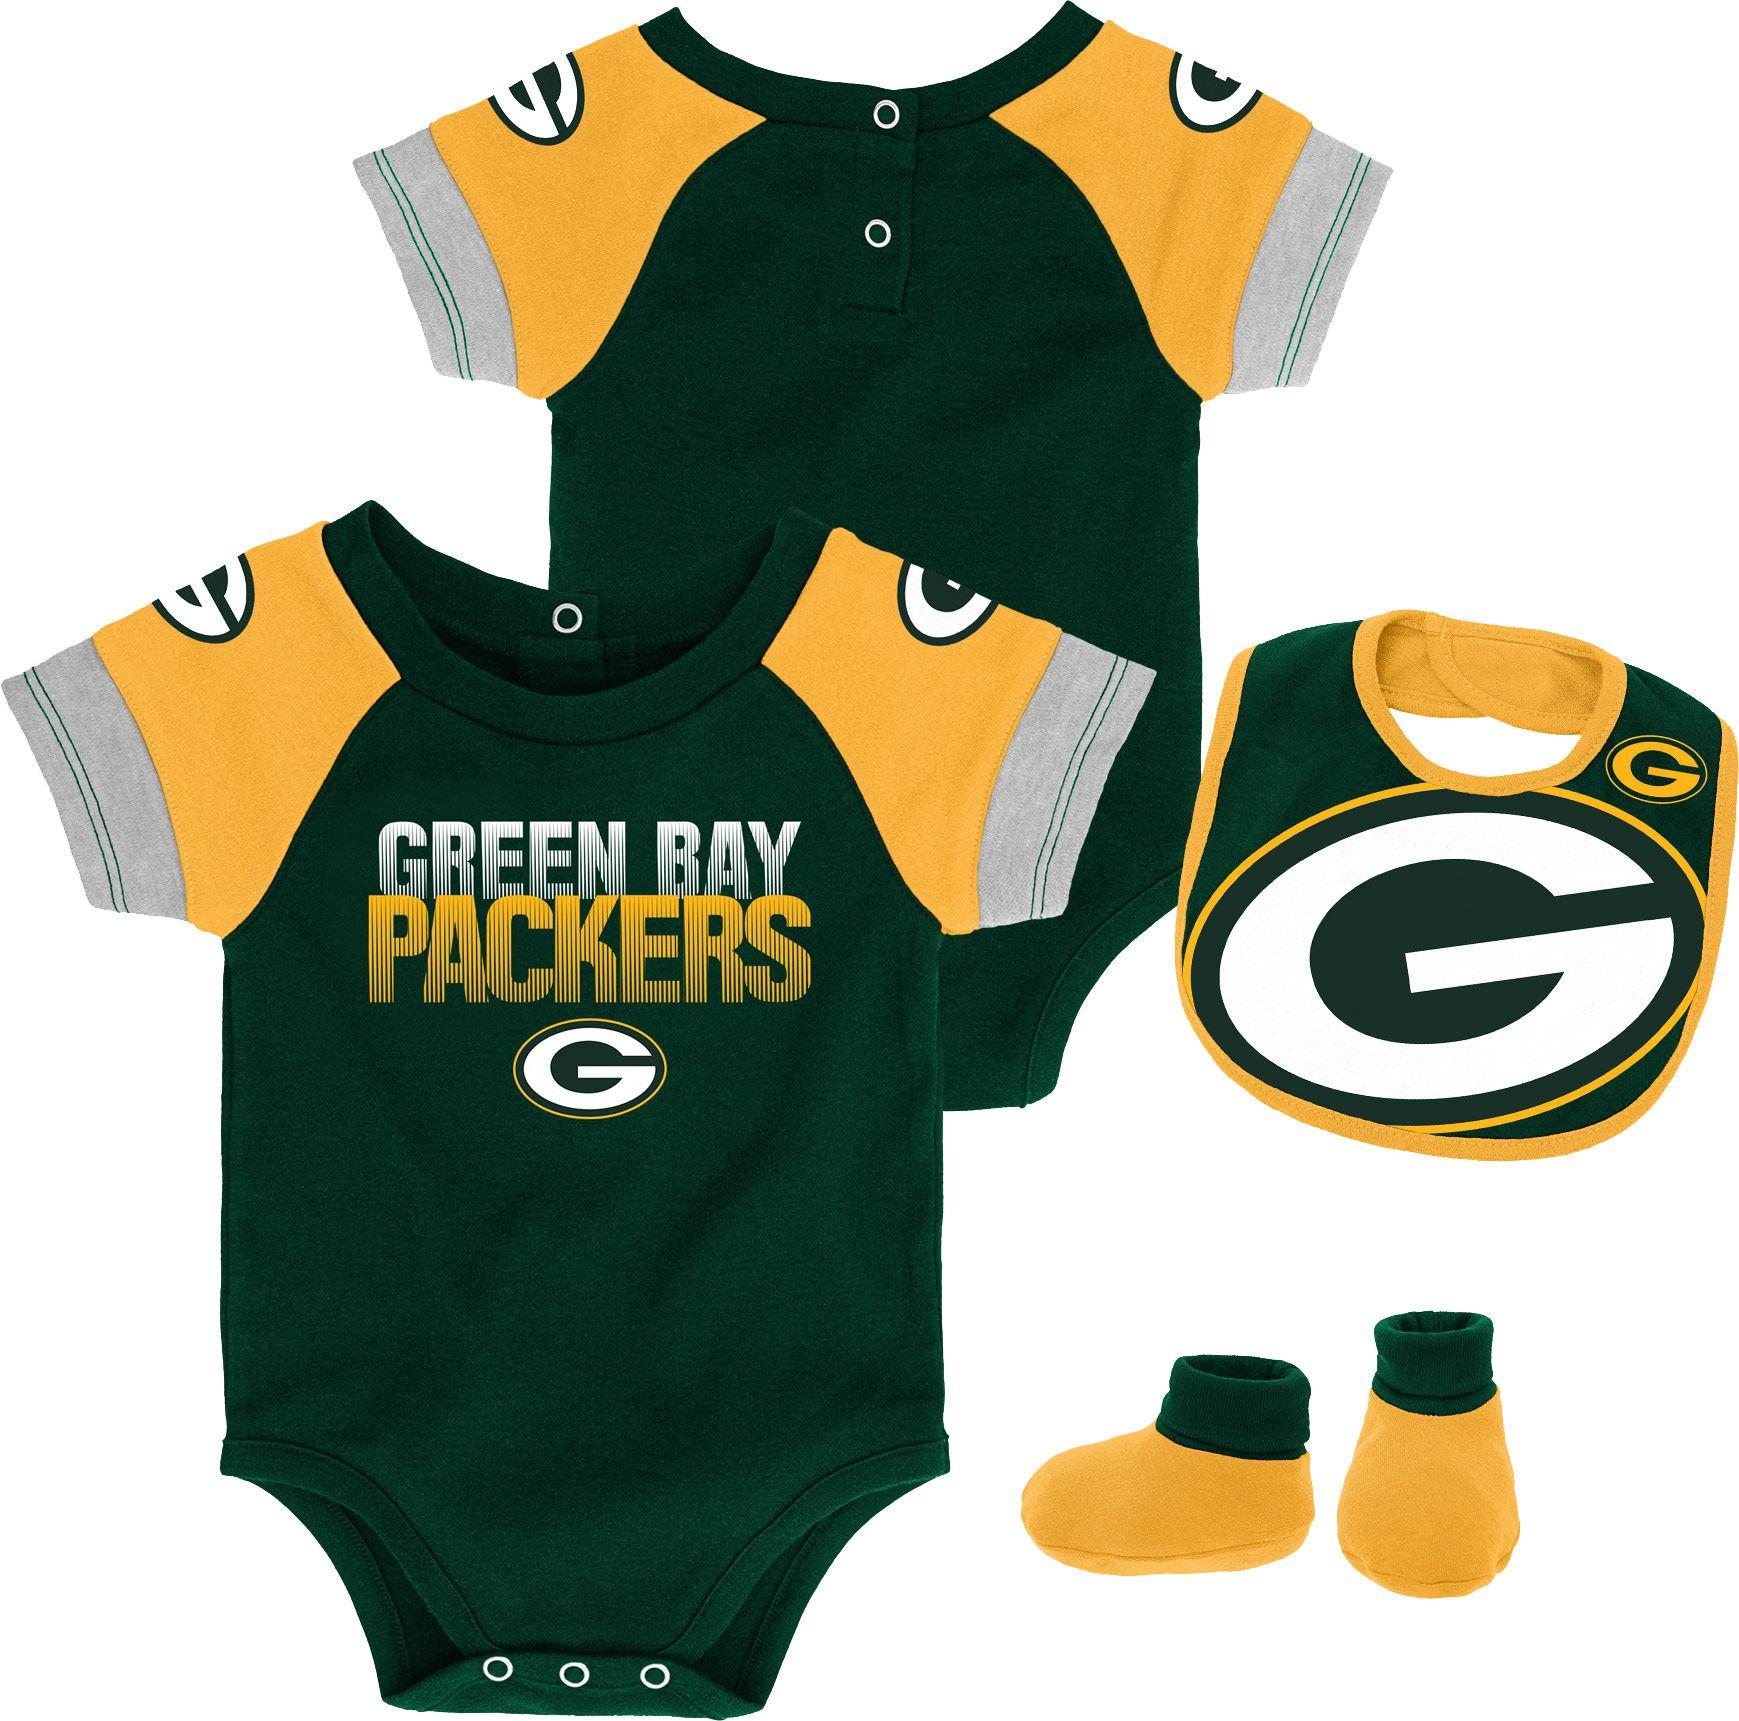 Team Apparel Infant Green Bay 50 Yard Onesie Set Green Bay Packers Team Apparel Green Bay